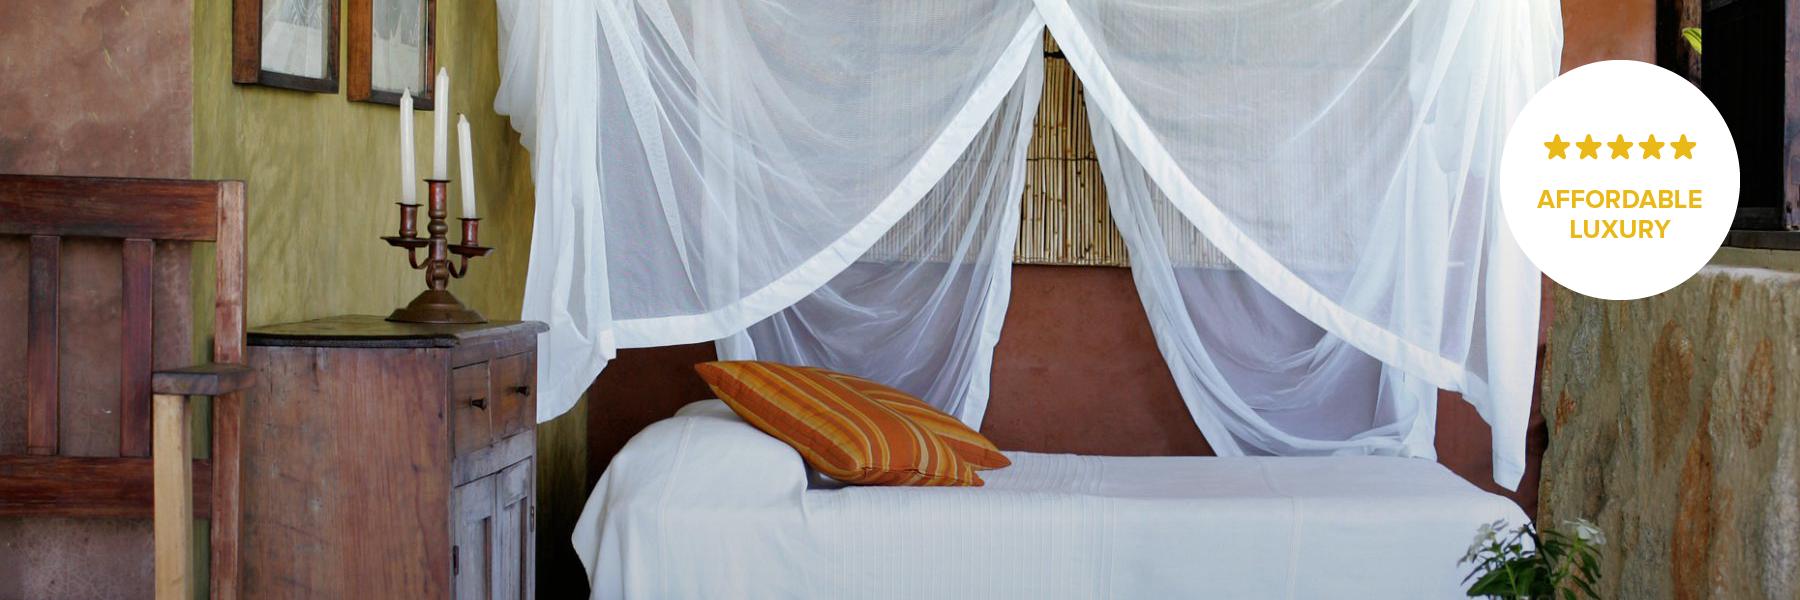 Deluxe mosquito net